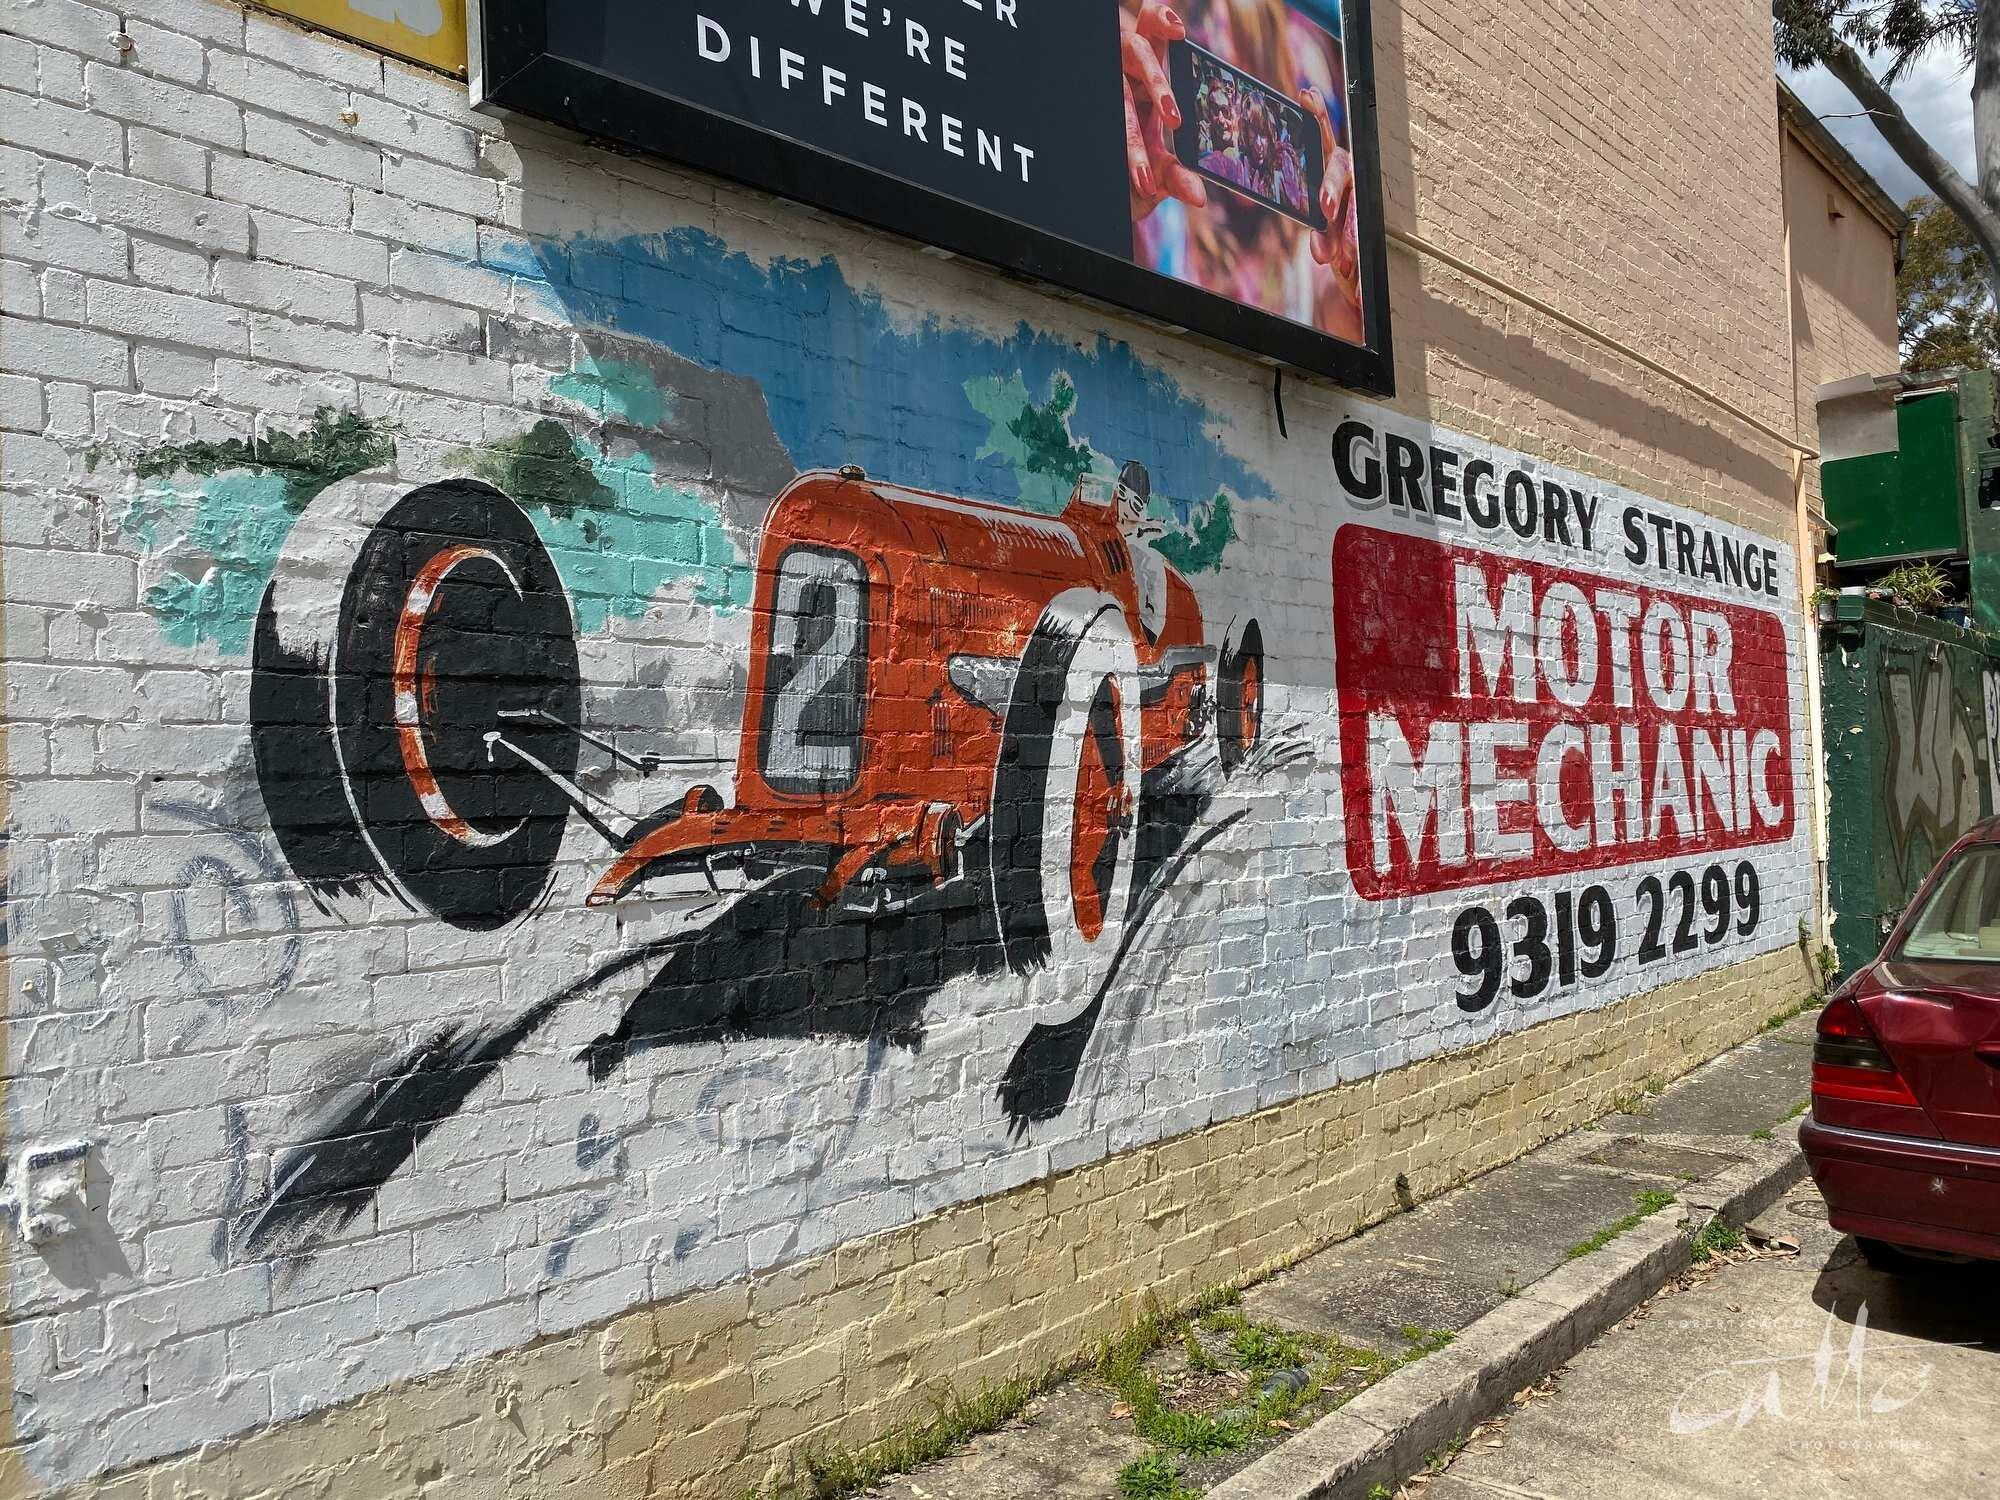 Cleveland St, Redfern (iPhone 11 Pro - normal lens)